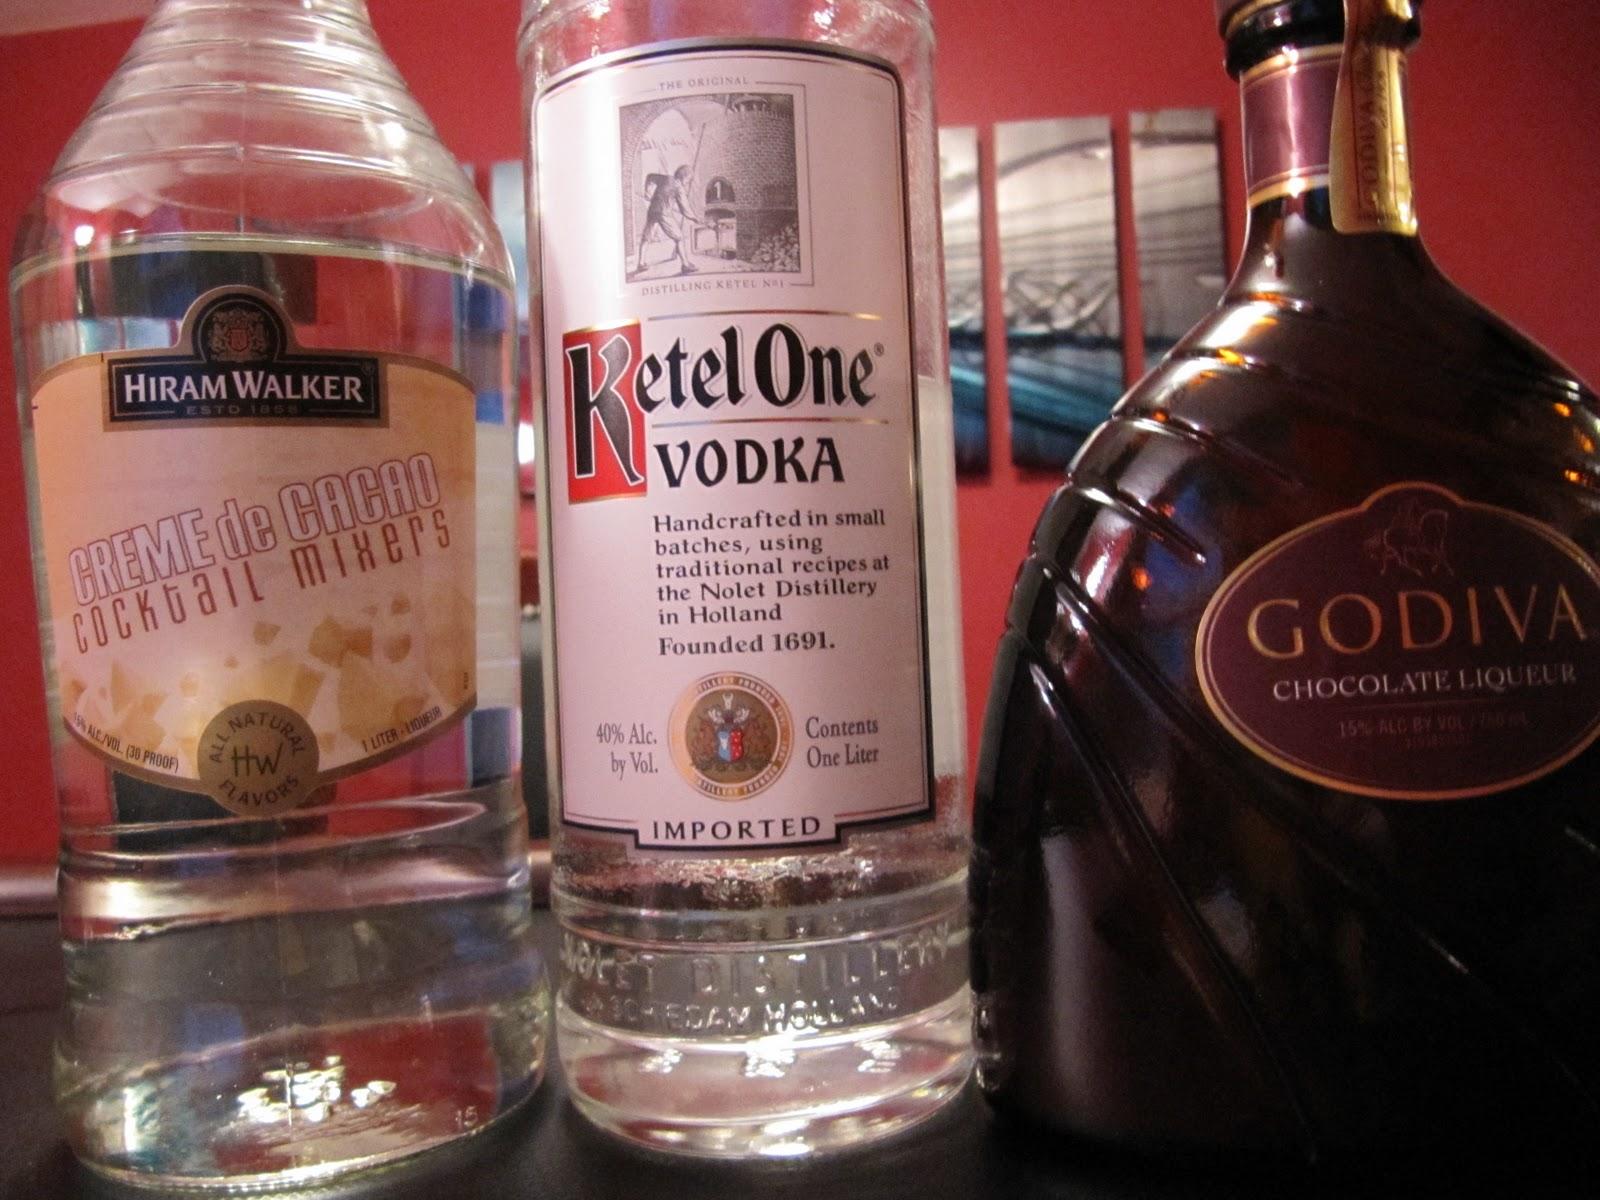 simply scotches the godiva chocolate martini